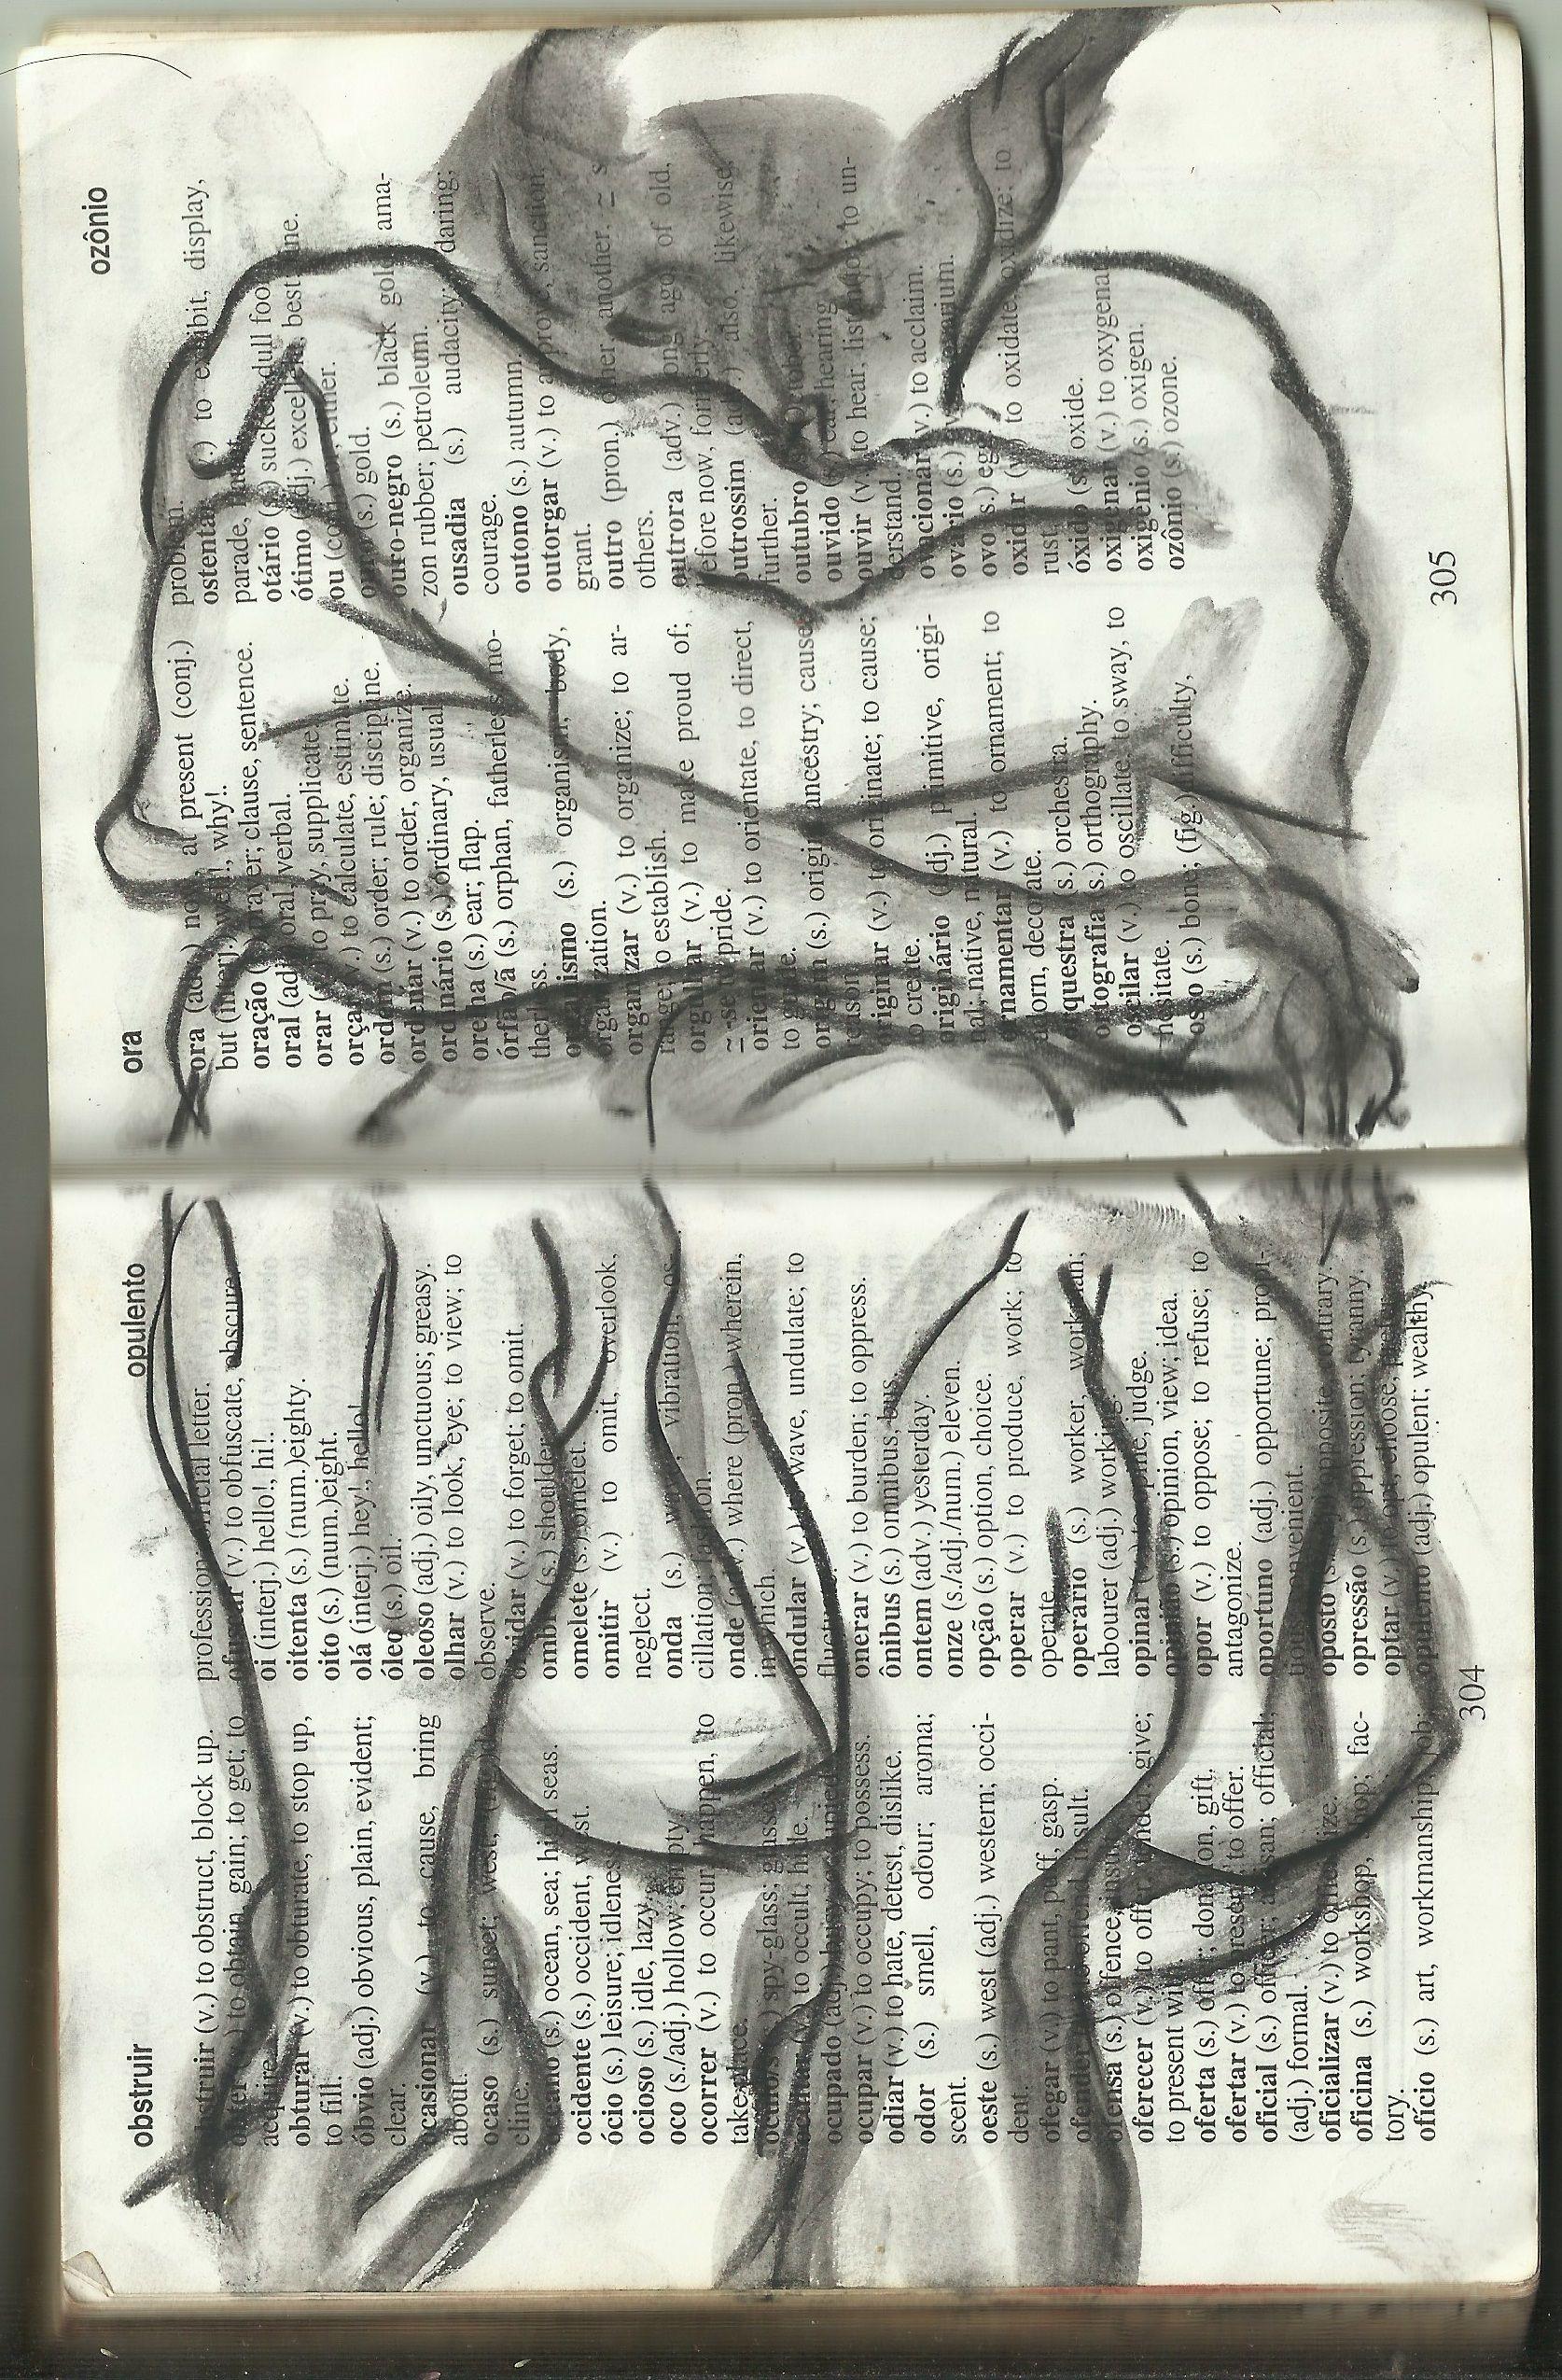 Carne ferida-desenho-Raylander Mártis